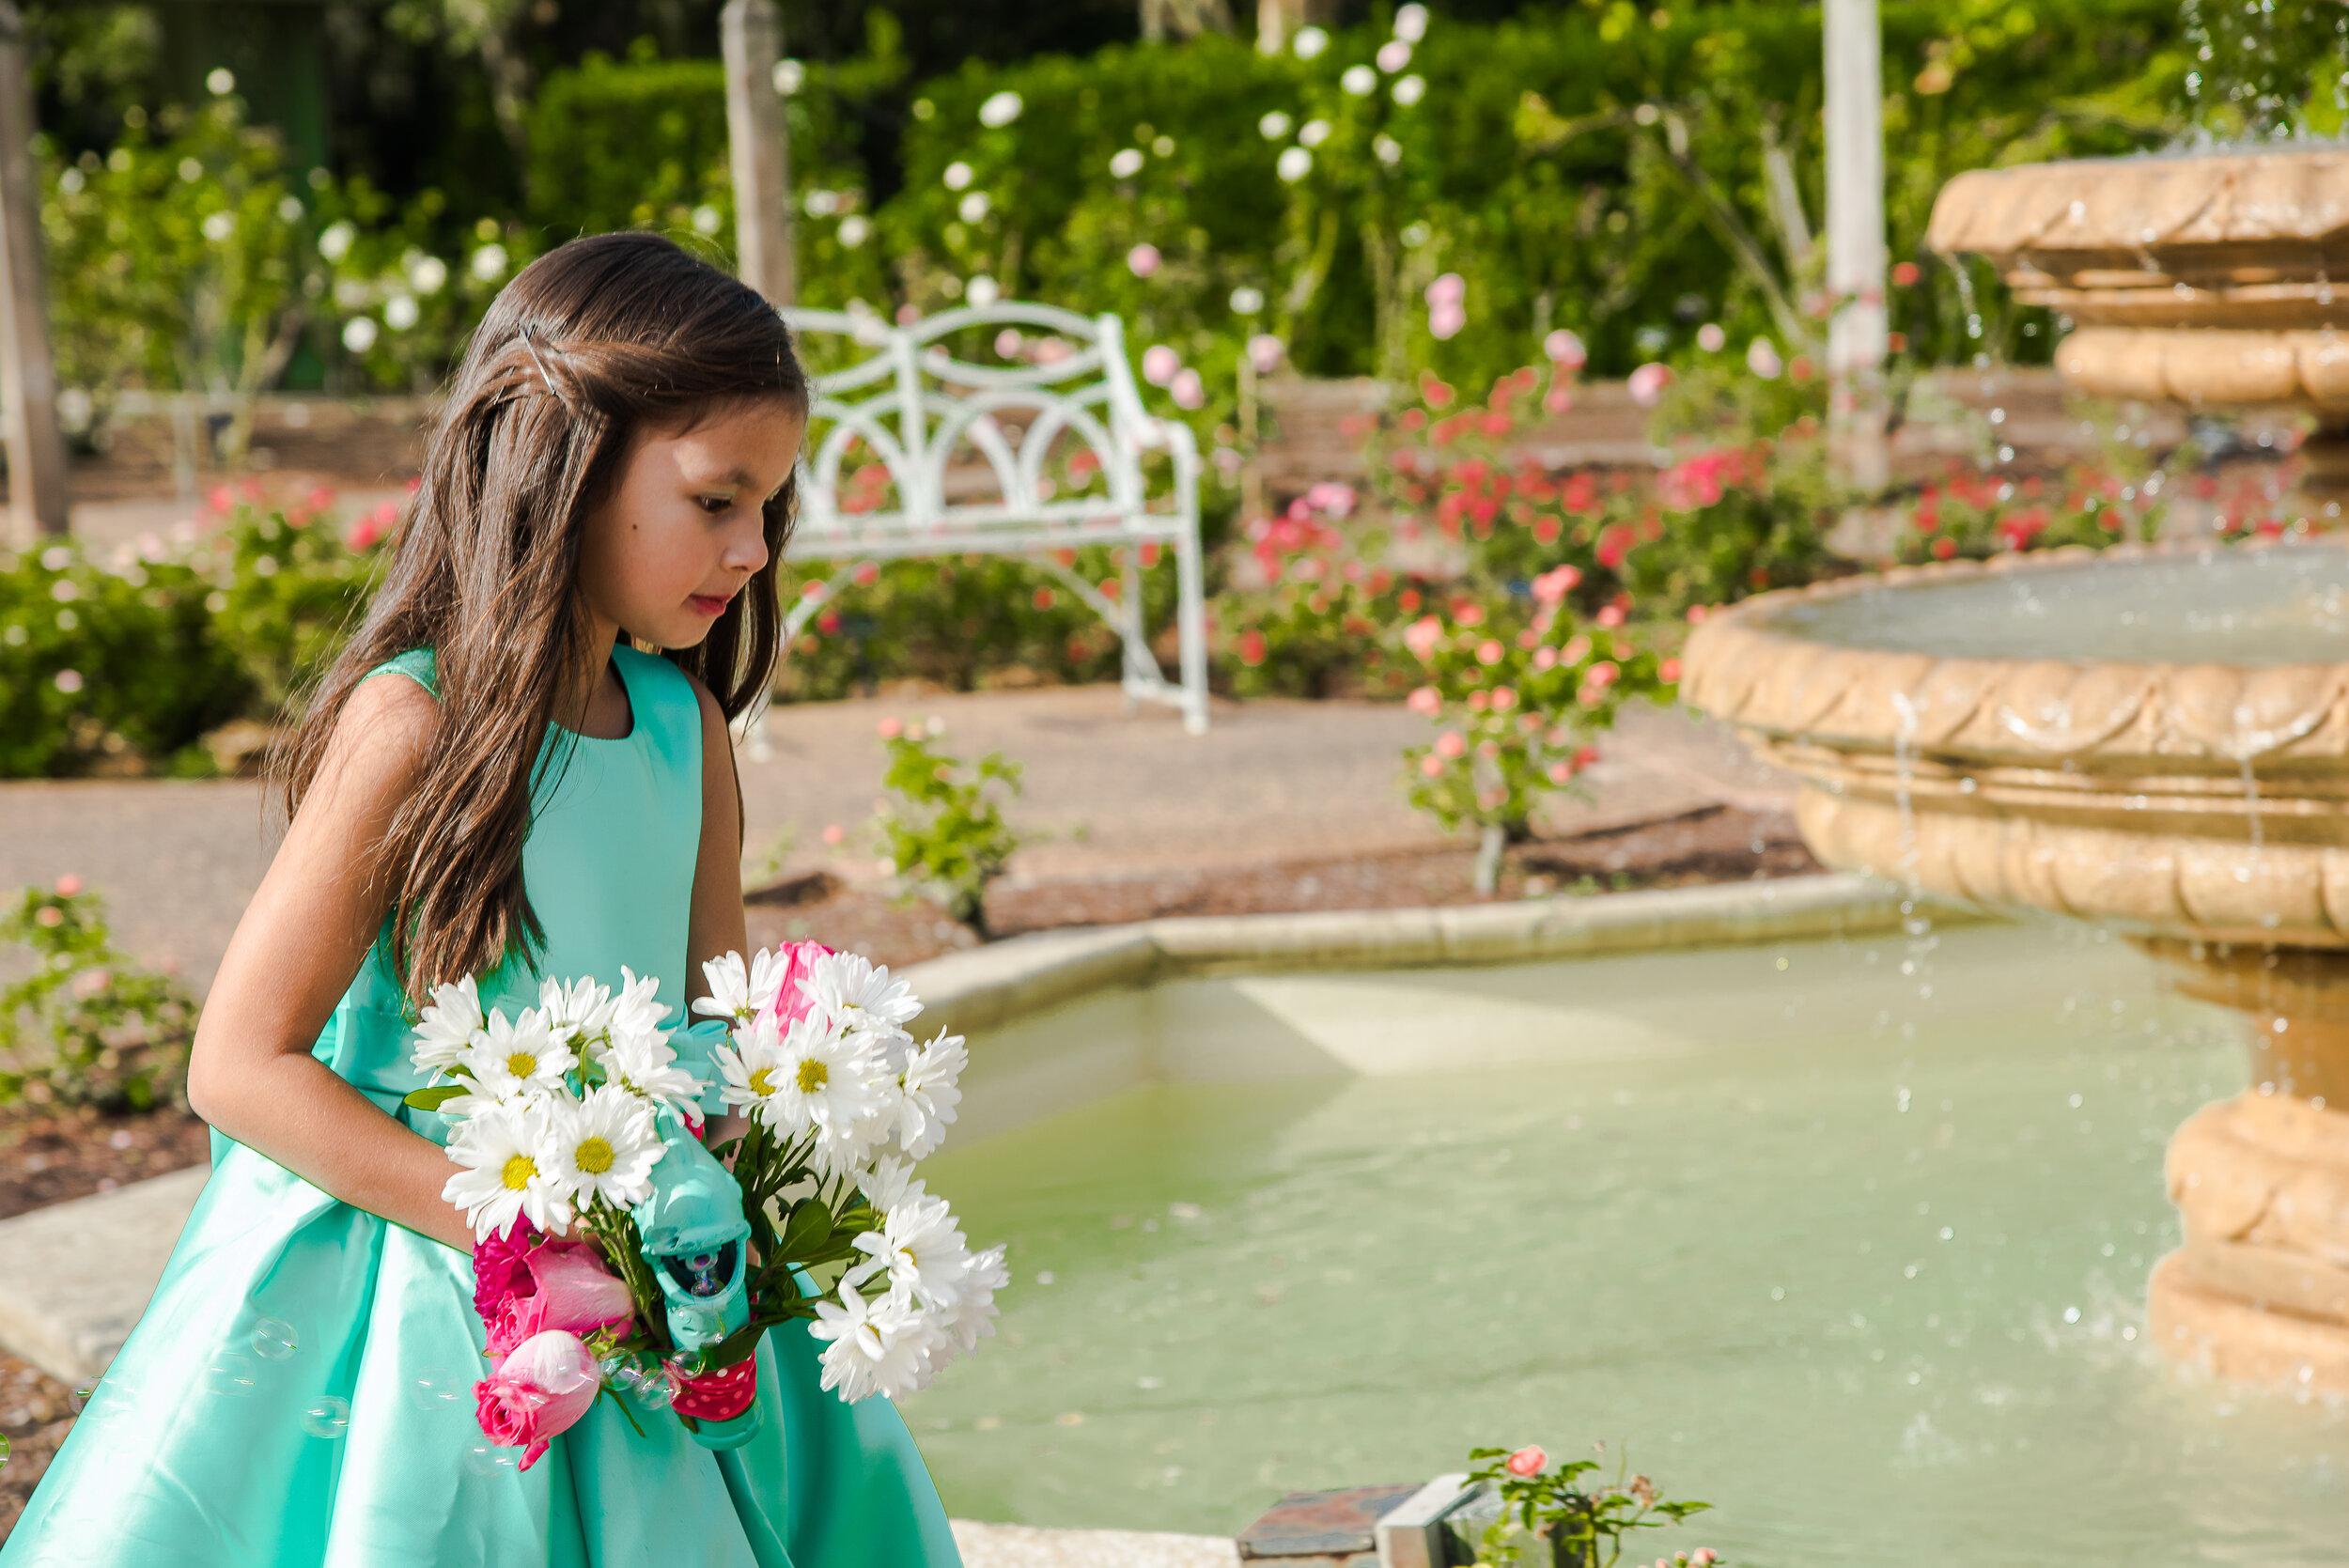 herry-garden-wedding-1-40.jpg